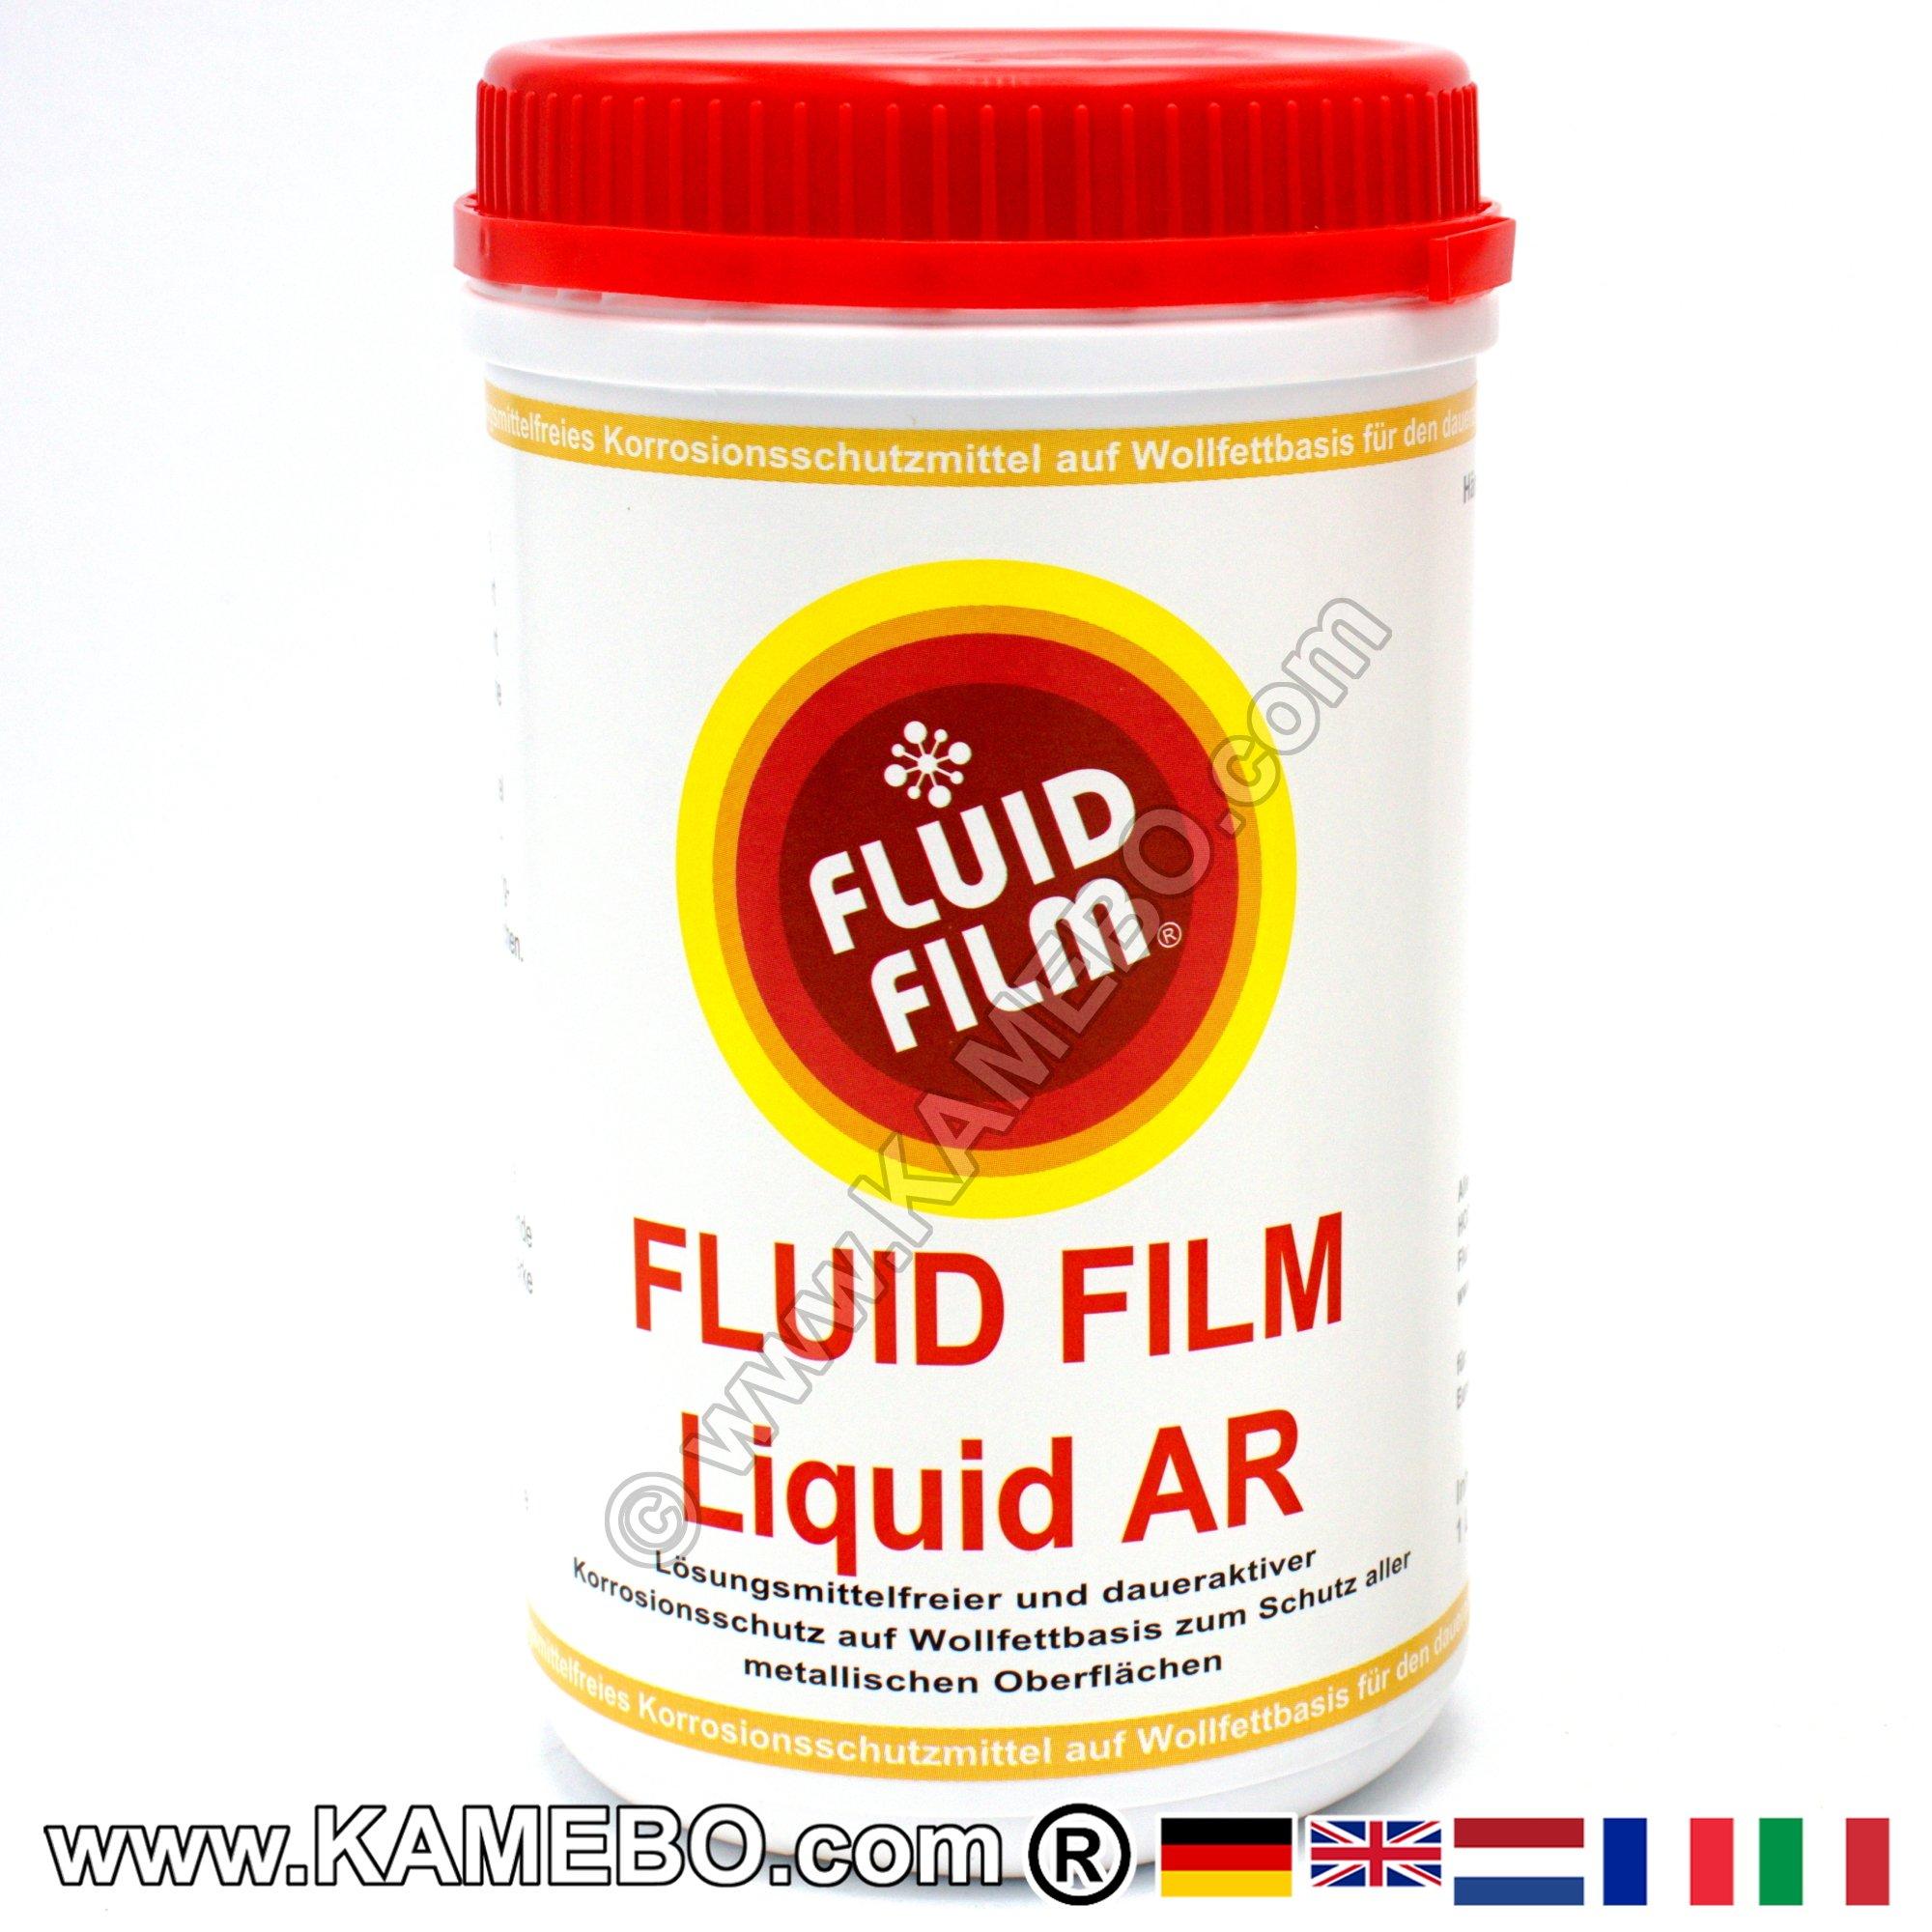 fluid film liquid ar rostschutzfett 1 liter kamebo. Black Bedroom Furniture Sets. Home Design Ideas